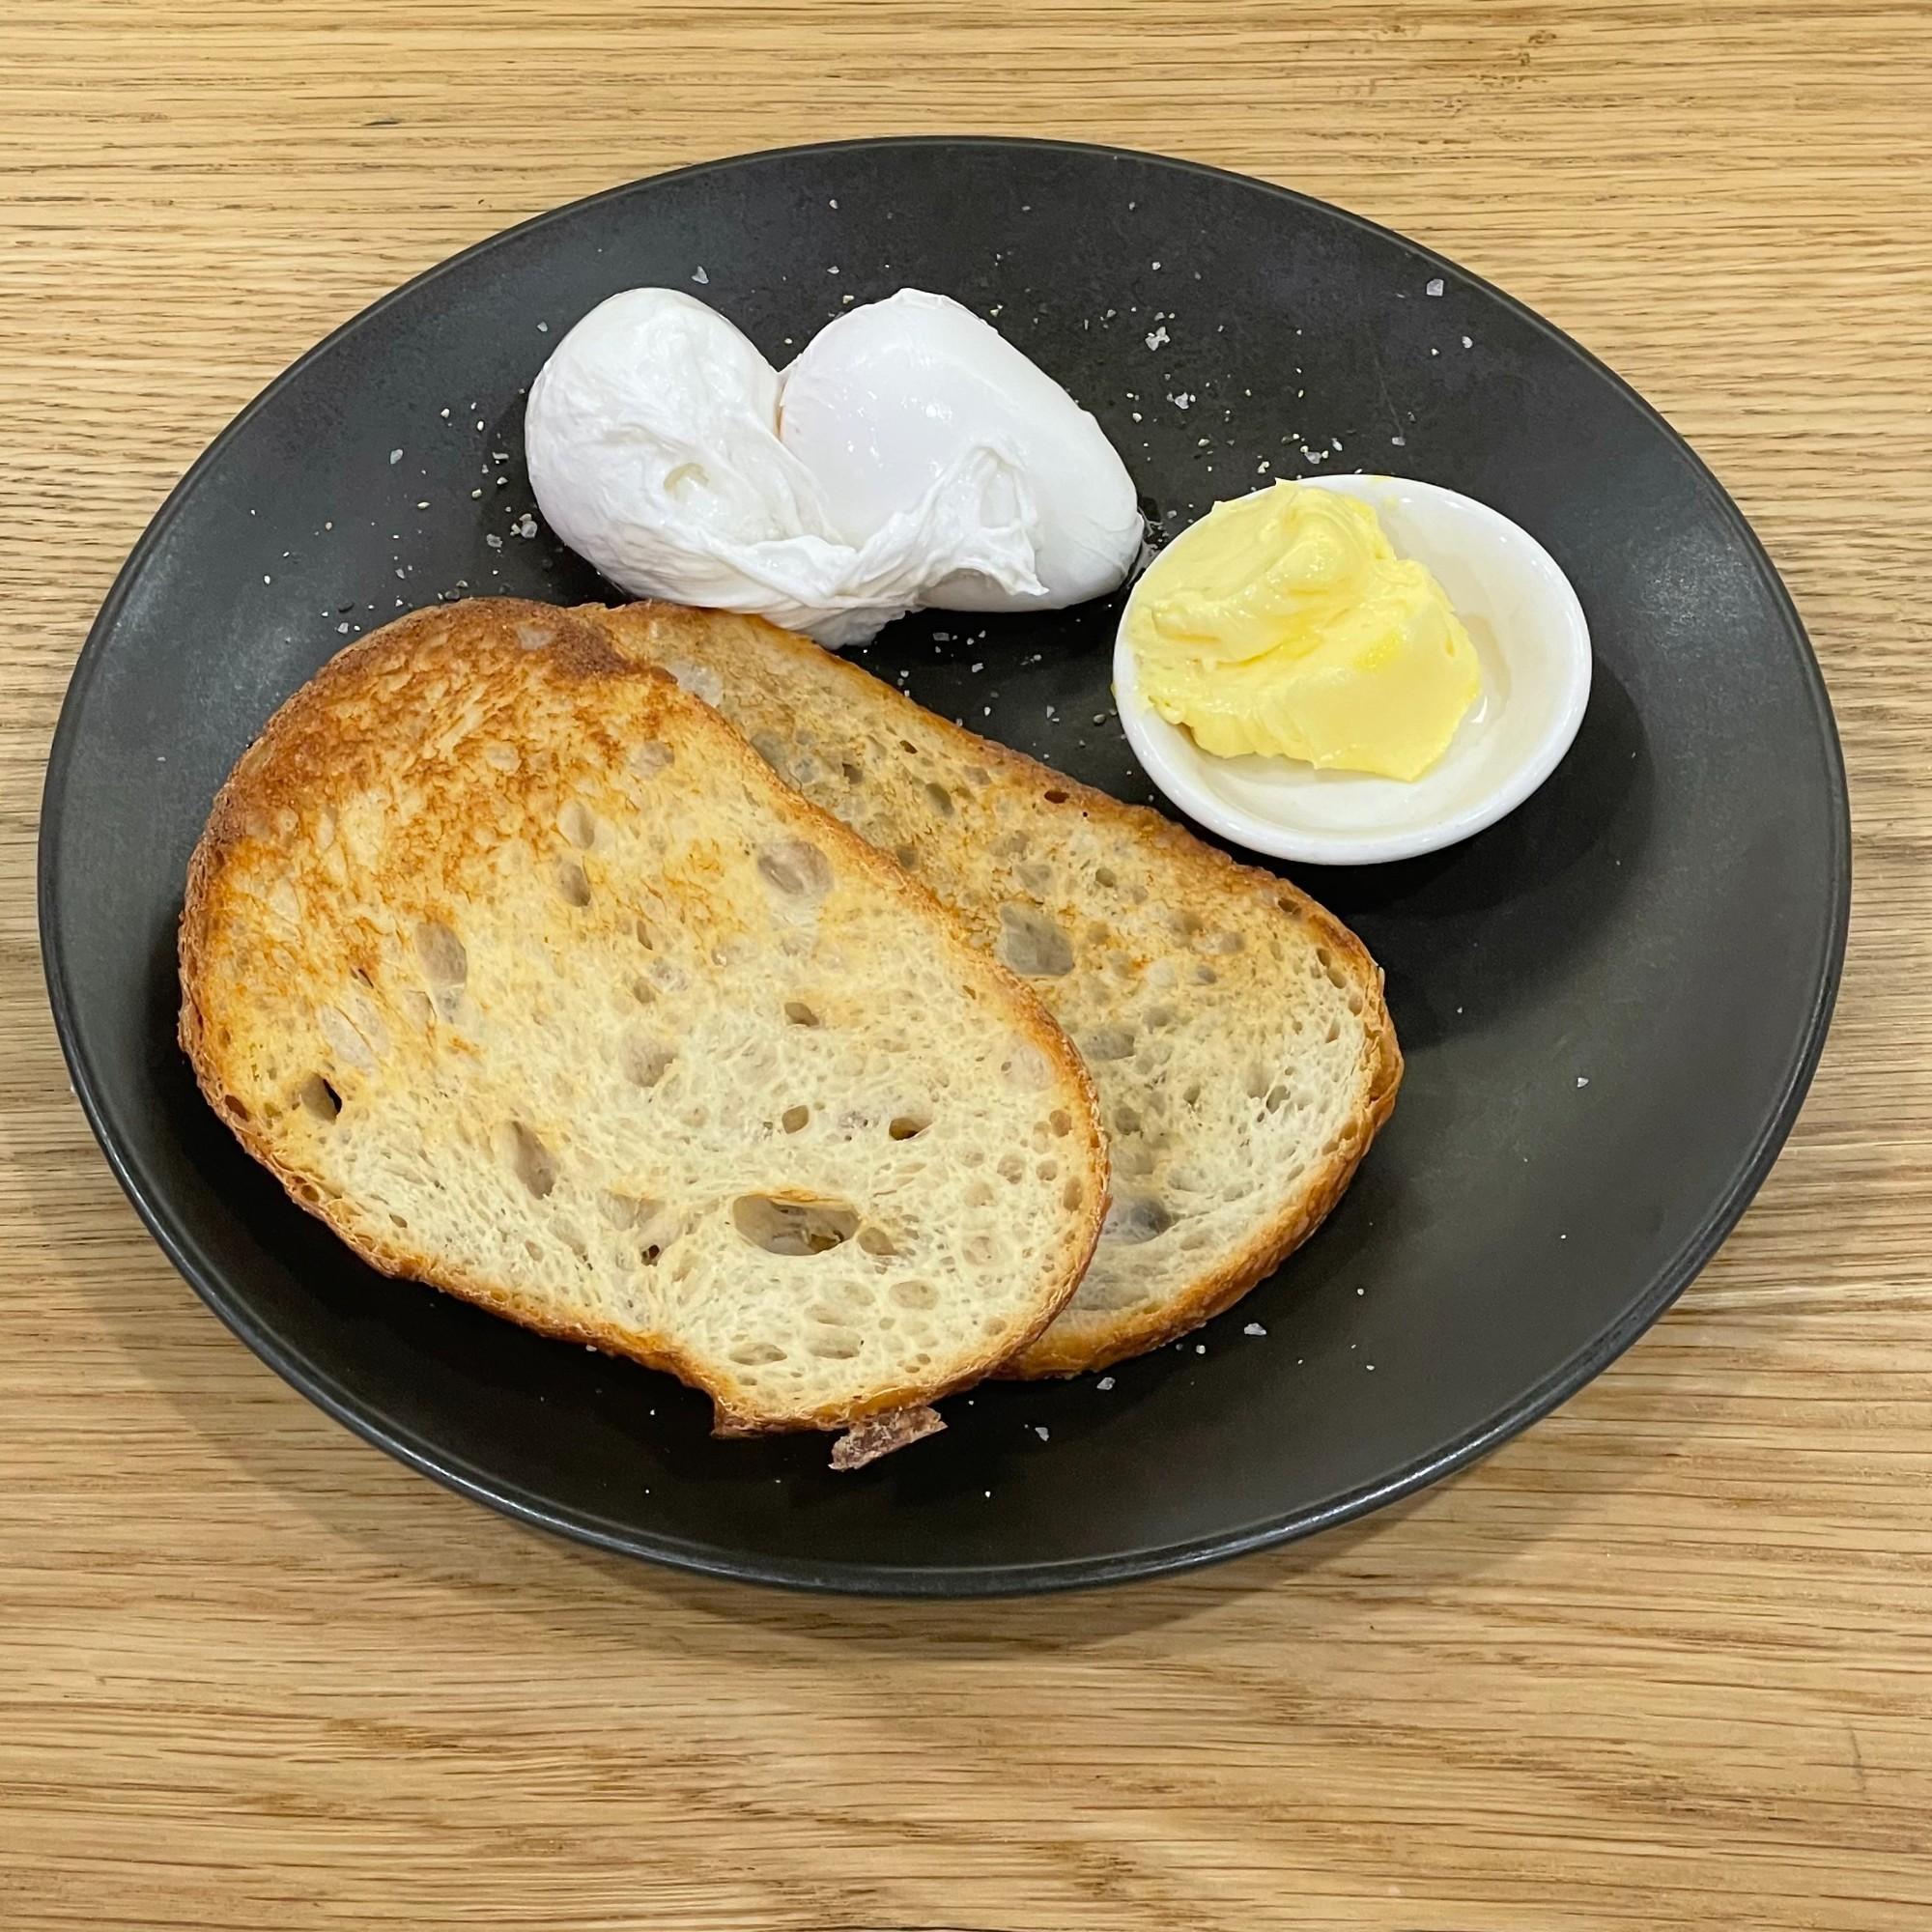 Free Range Poached Eggs on Toast